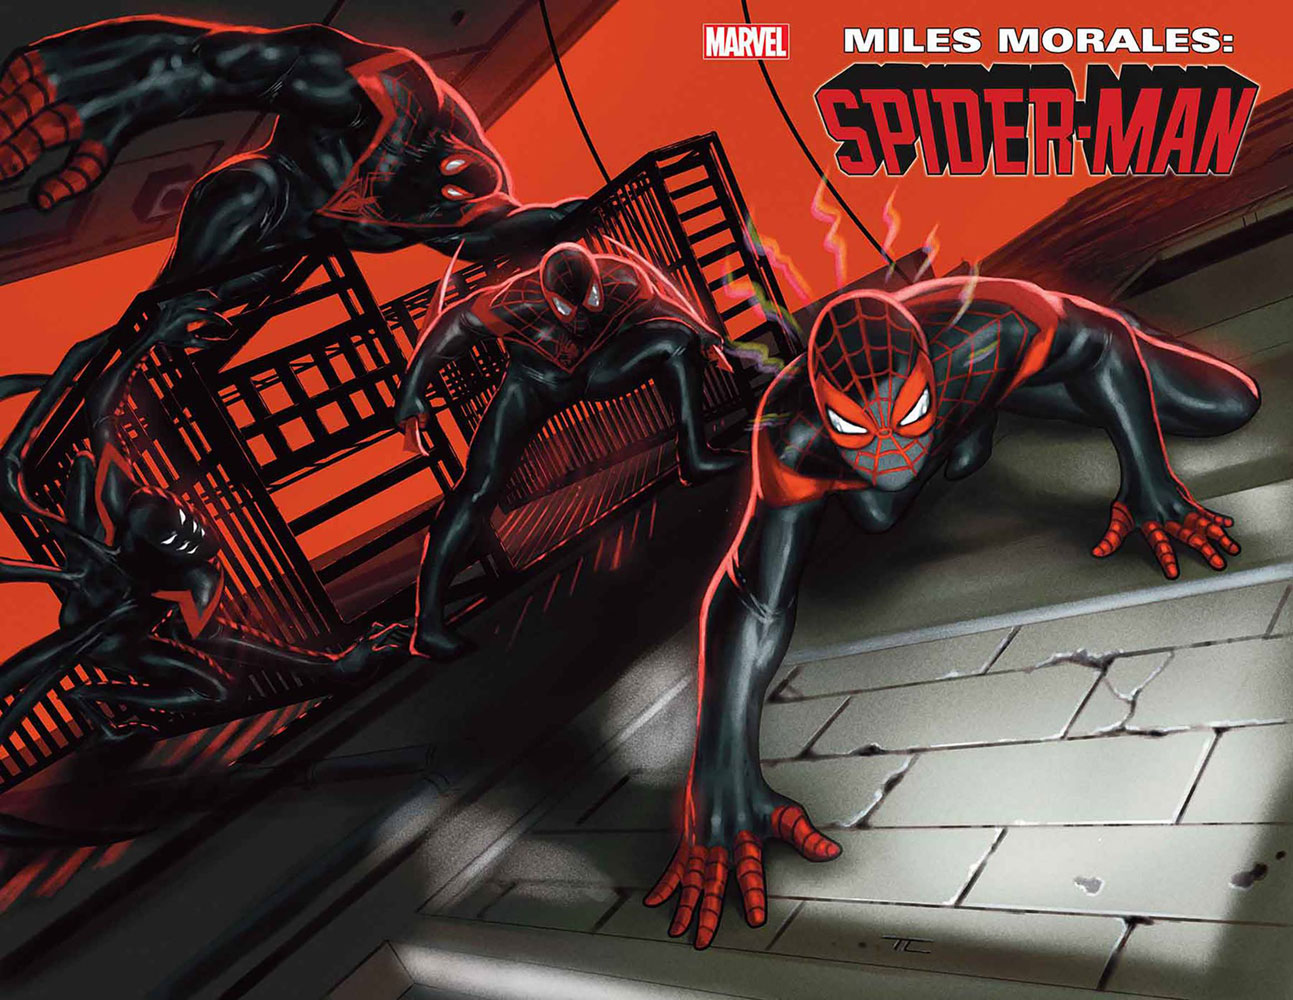 Miles Morales: Spider-Man #25 - Marvel Comics